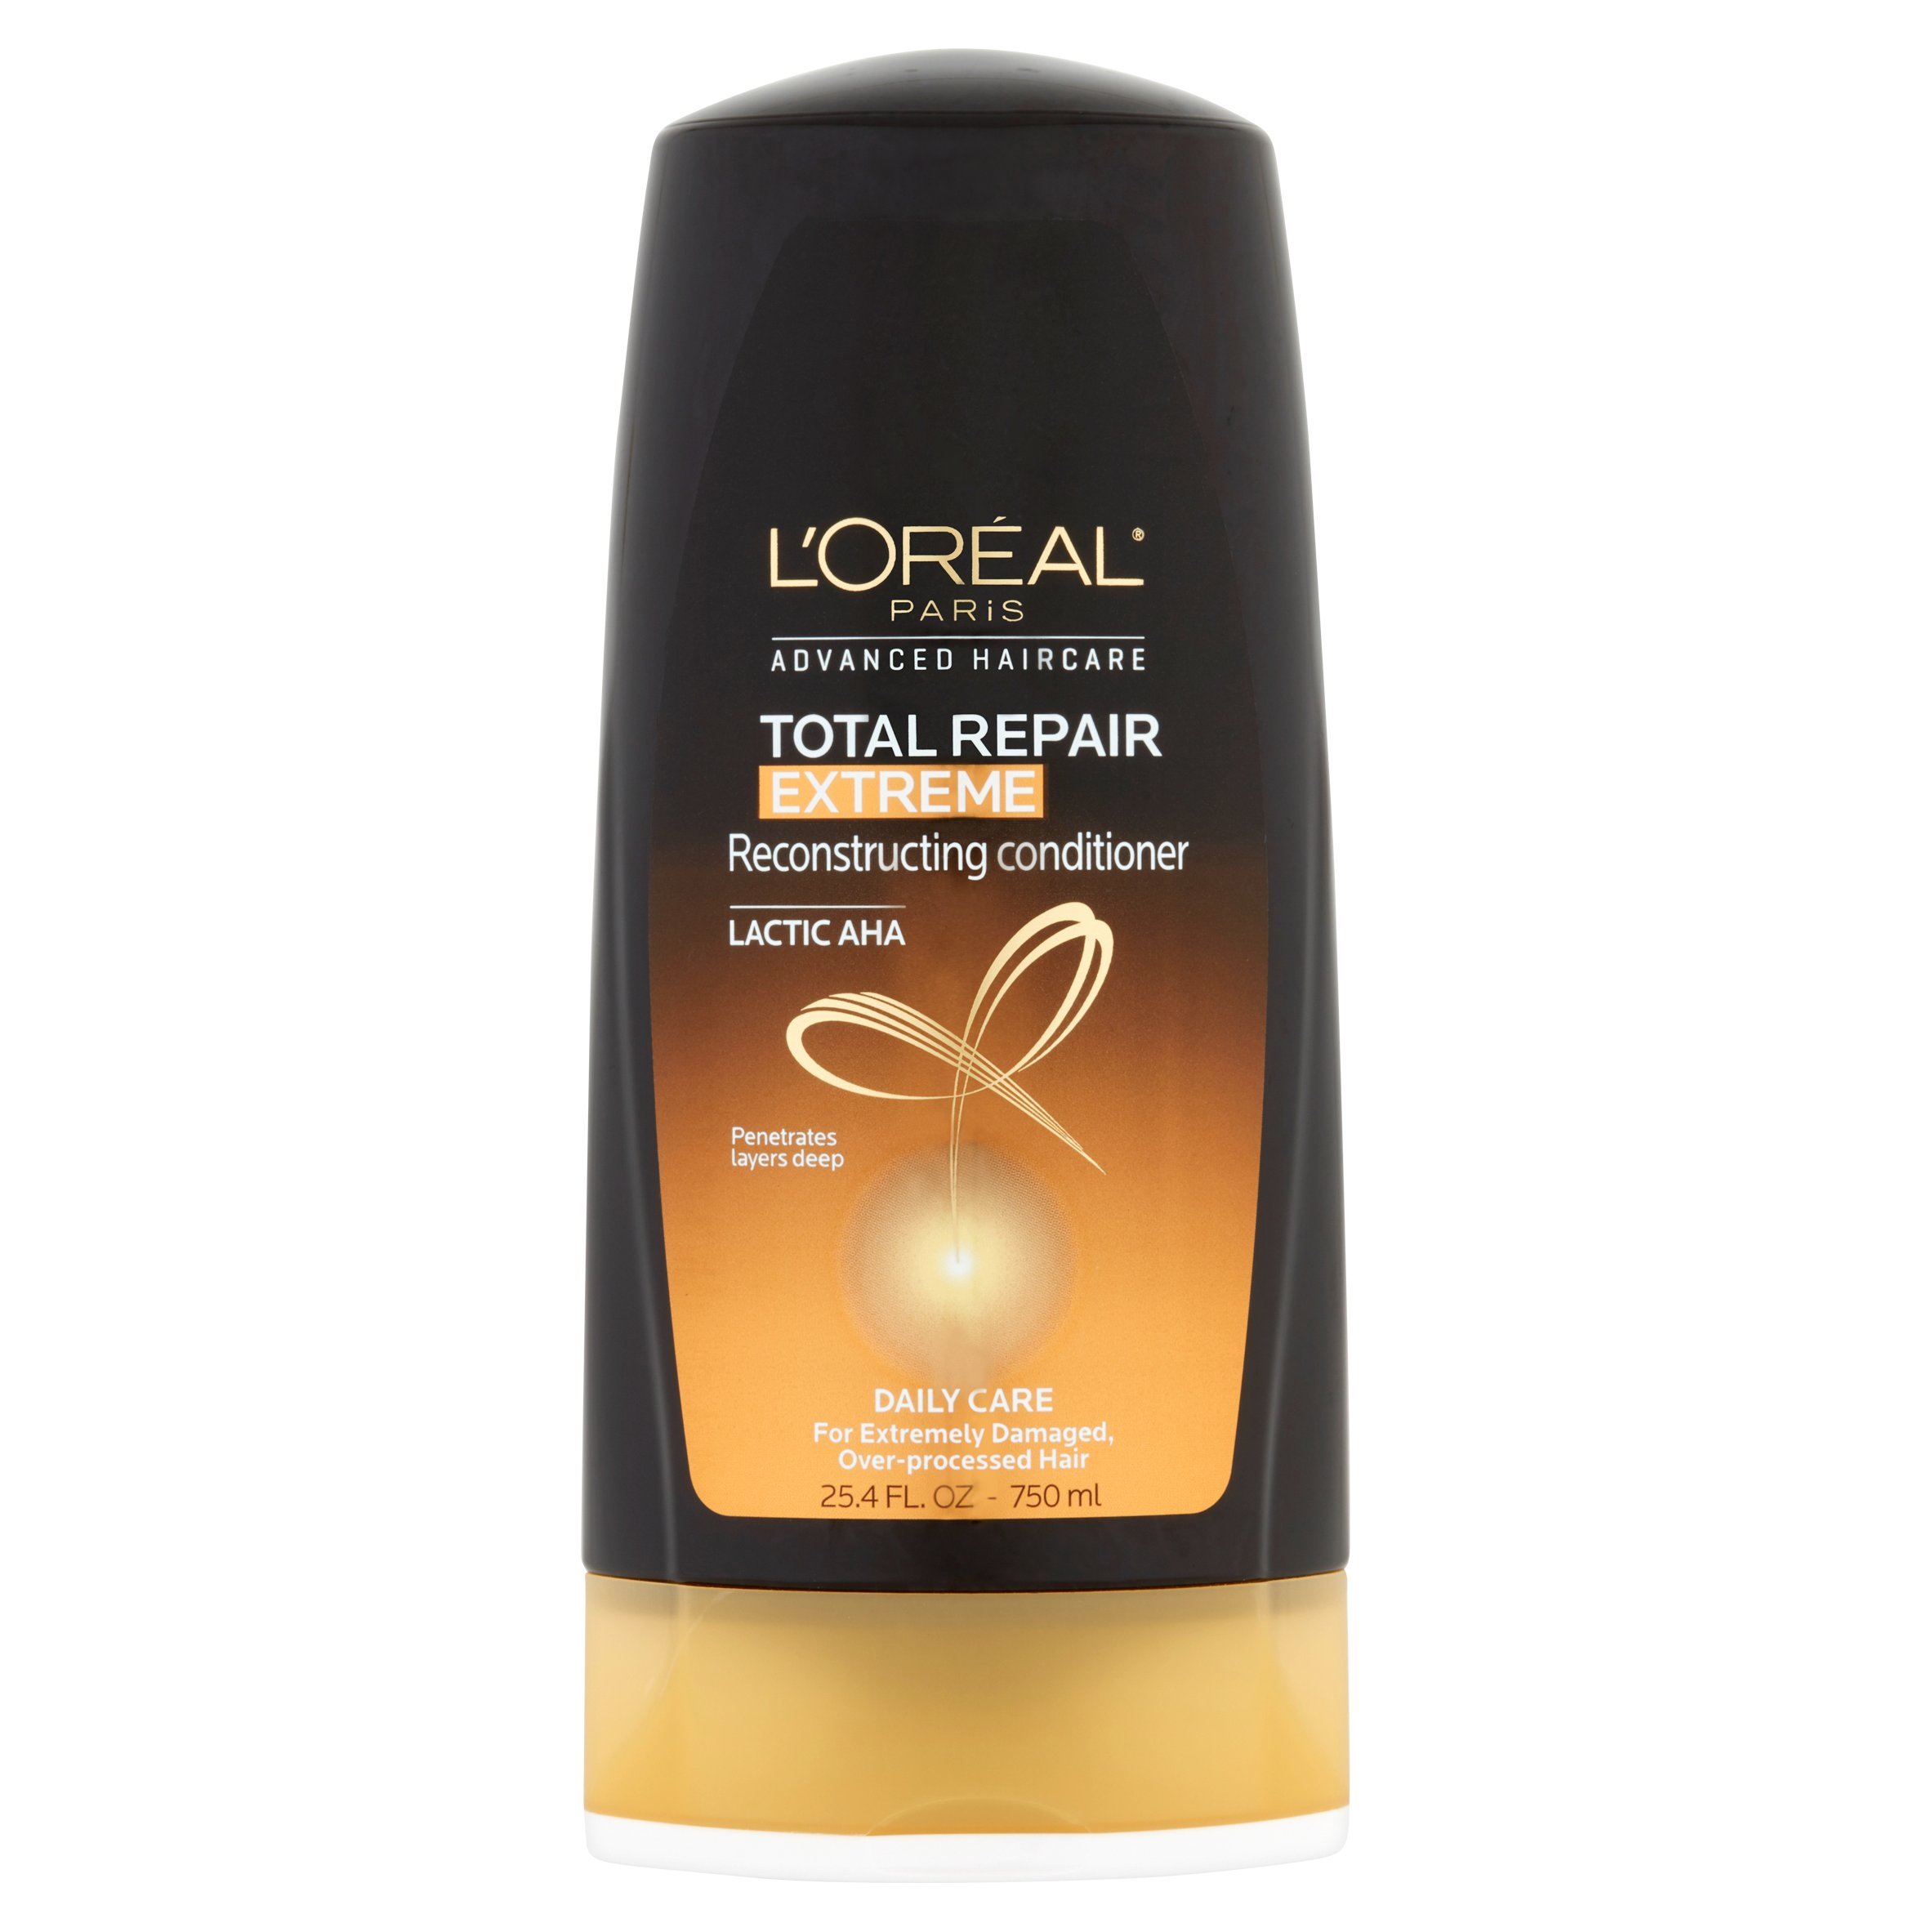 L'Oreal Paris Hair Expert Total Repair Extreme Reconstructing Conditioner 25.4 FL OZ